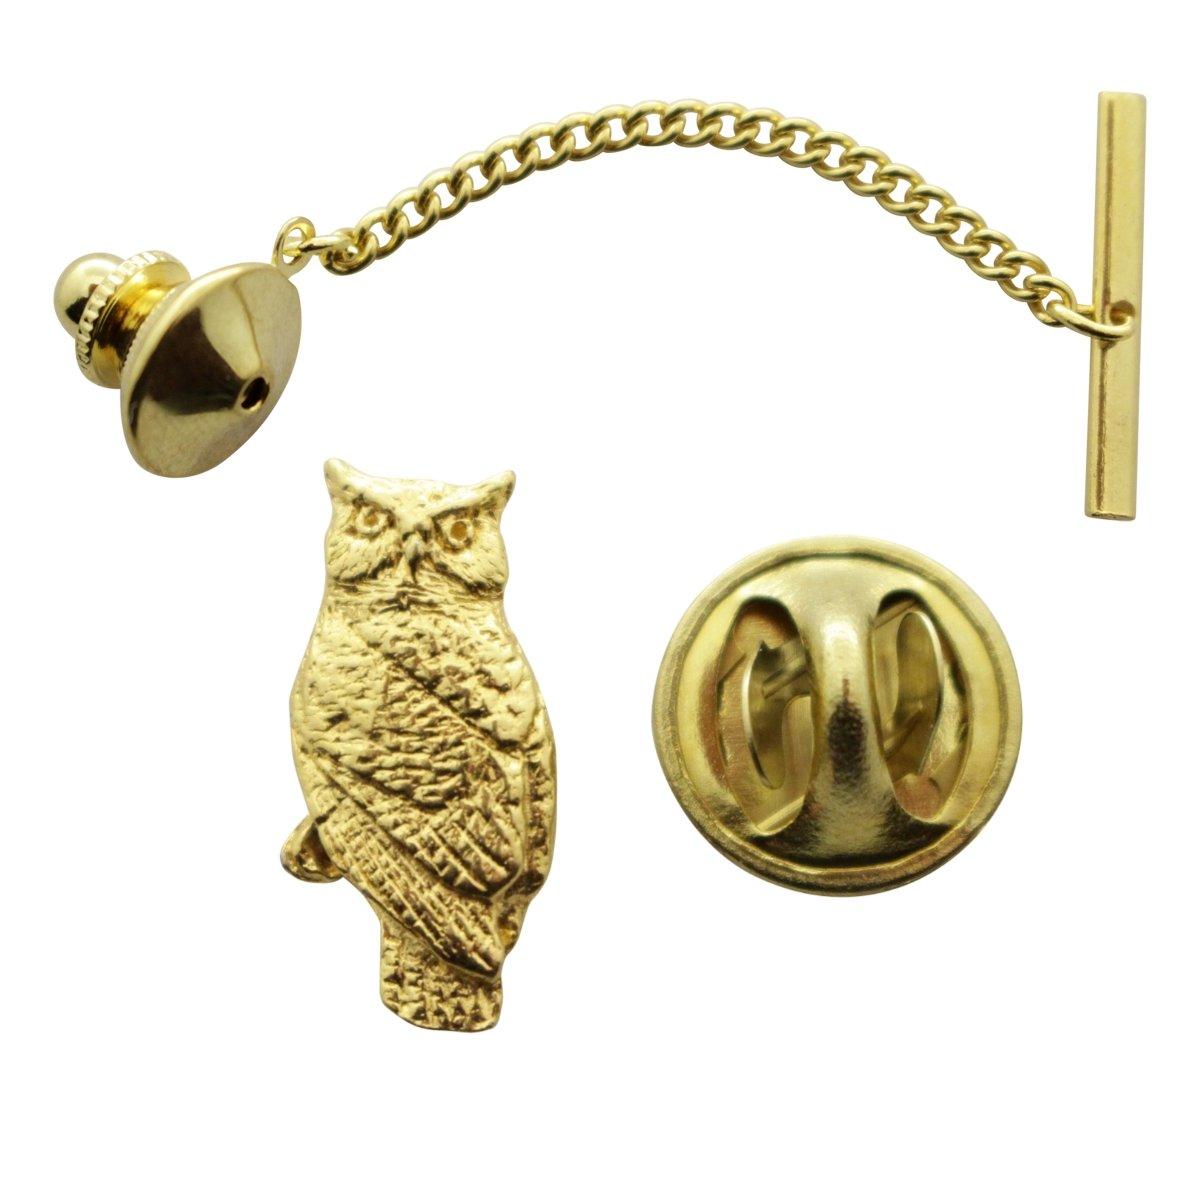 Sarahs Treats /& Treasures Owl Tie Tack ~ 24K Gold ~ Tie Tack or Pin